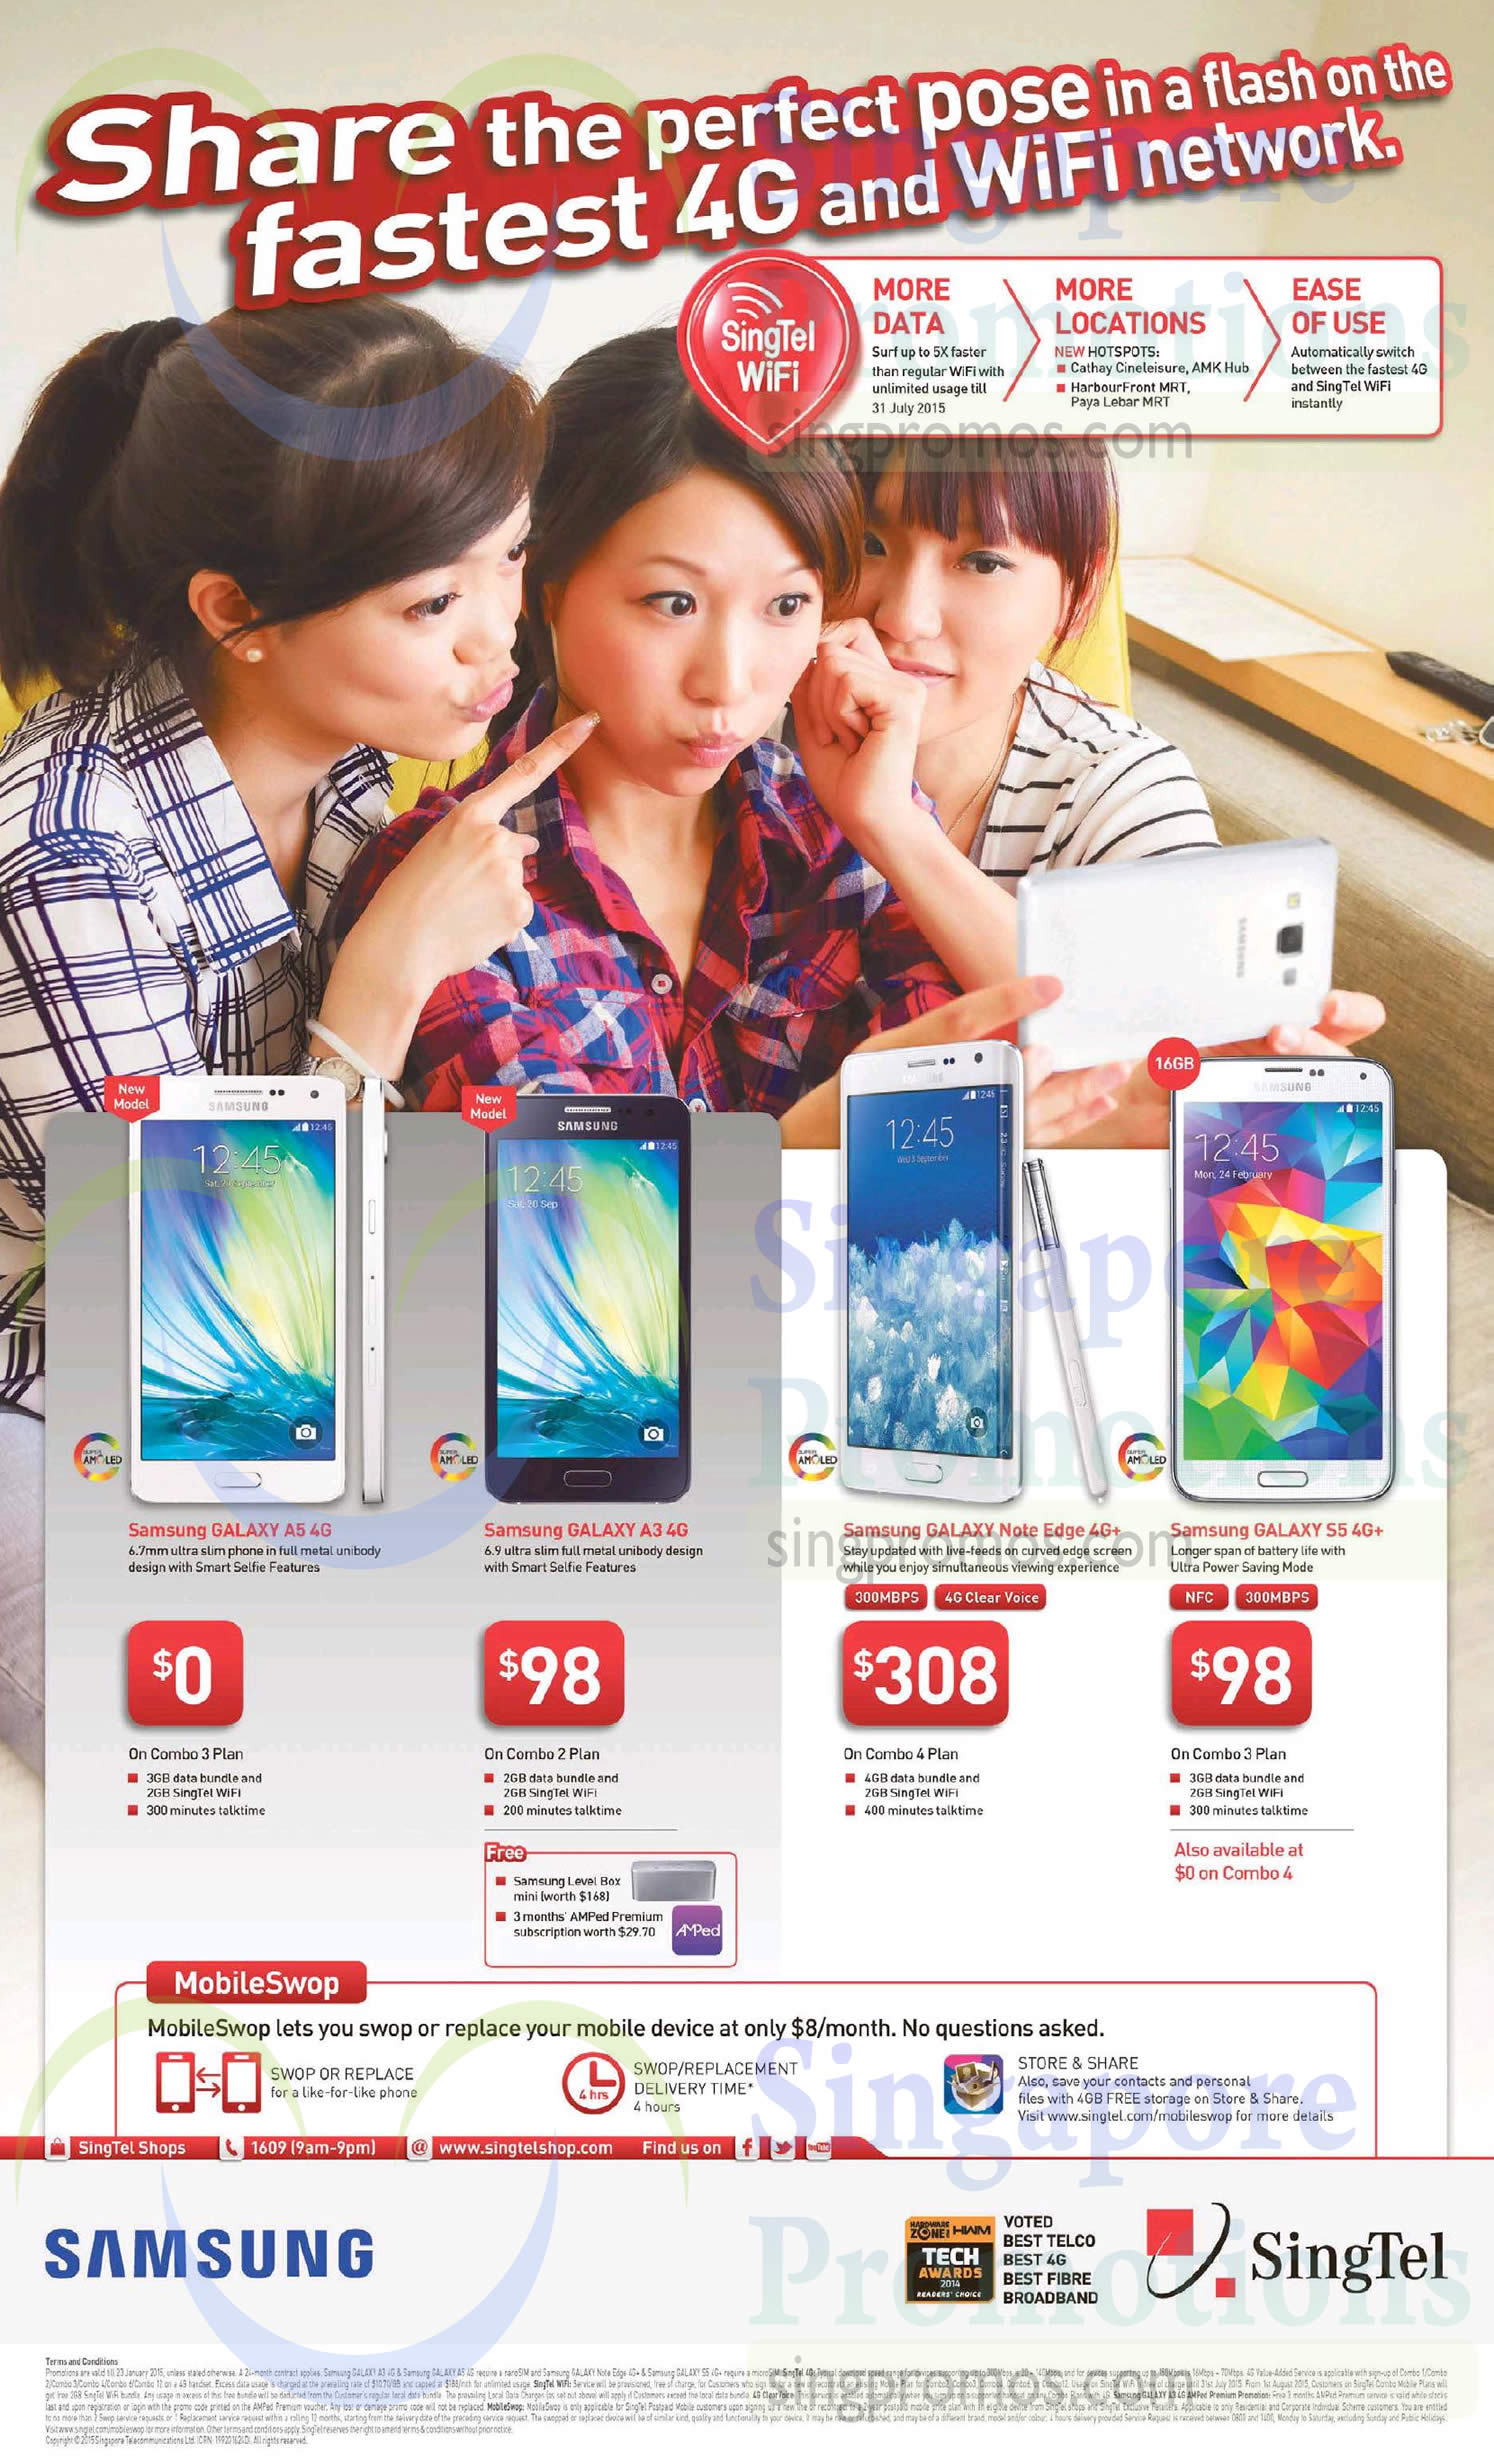 Samsung Galaxy A5, Samsung Galaxy A3, Samsung Galaxy Note Edge, Samsung Galaxy S5